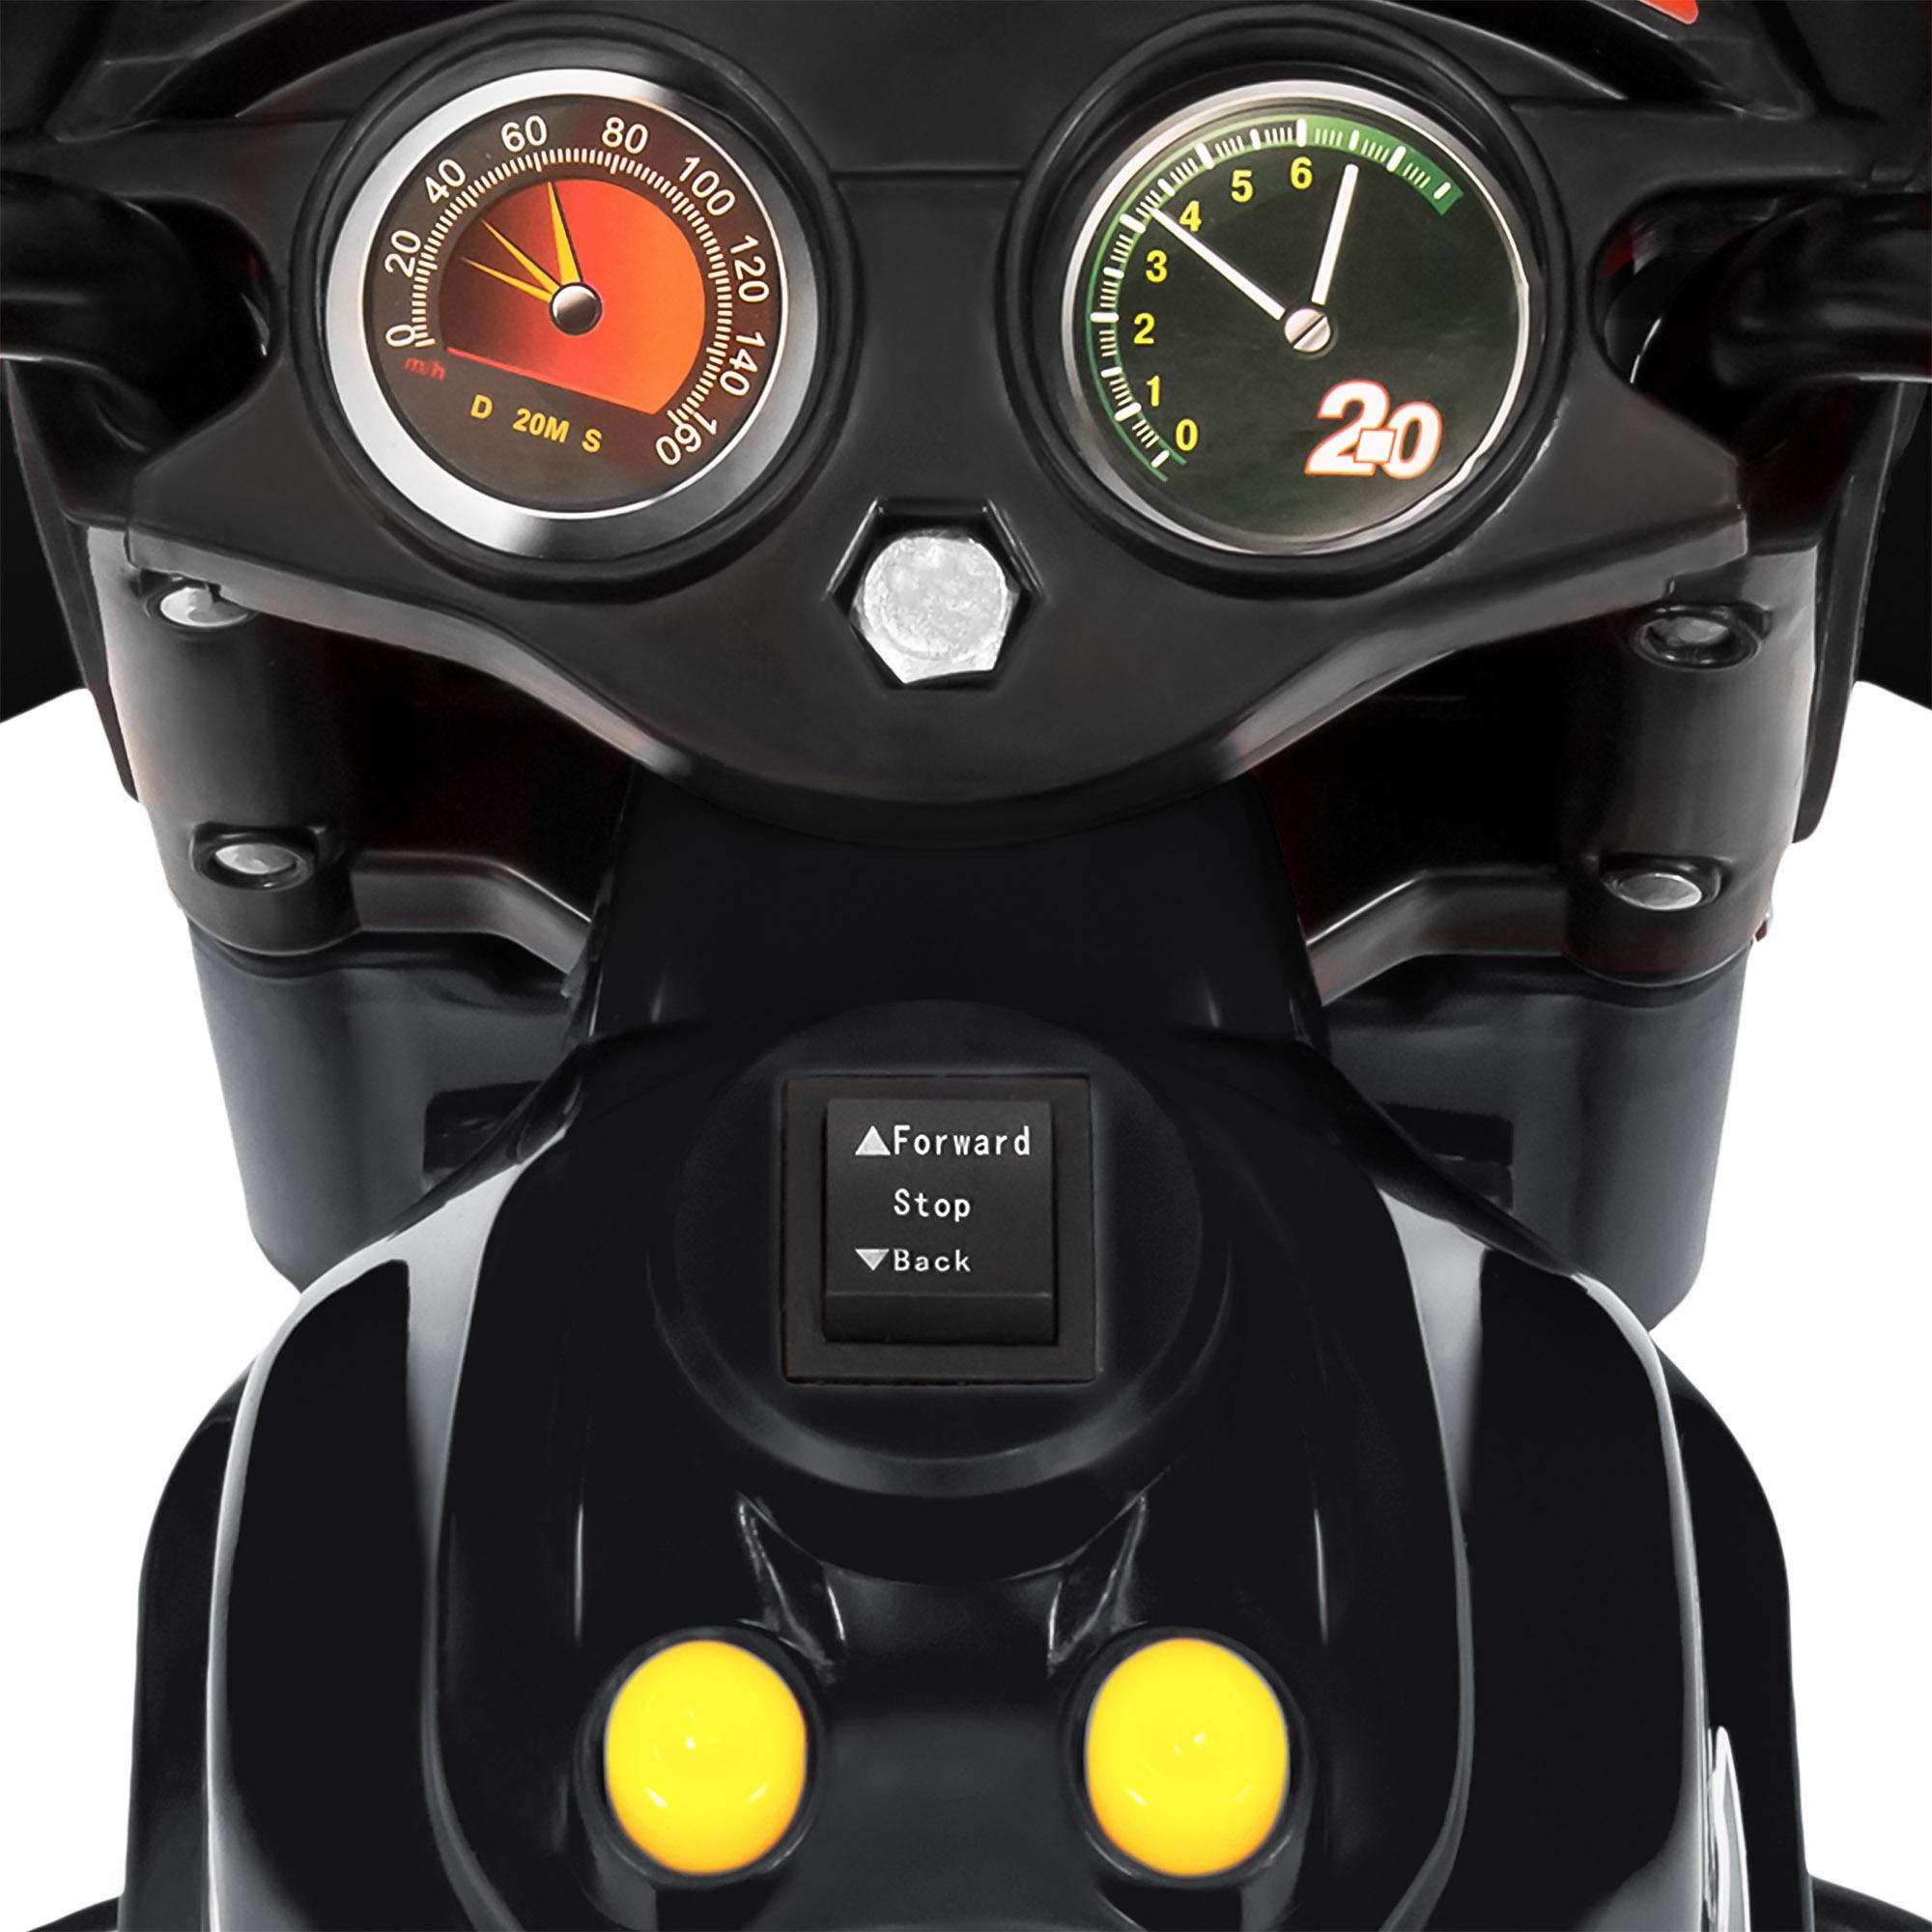 BCP-6V-Kids-3-Wheel-Motorcycle-Ride-On-Toy-w-LED-Lights-Music-Storage thumbnail 12